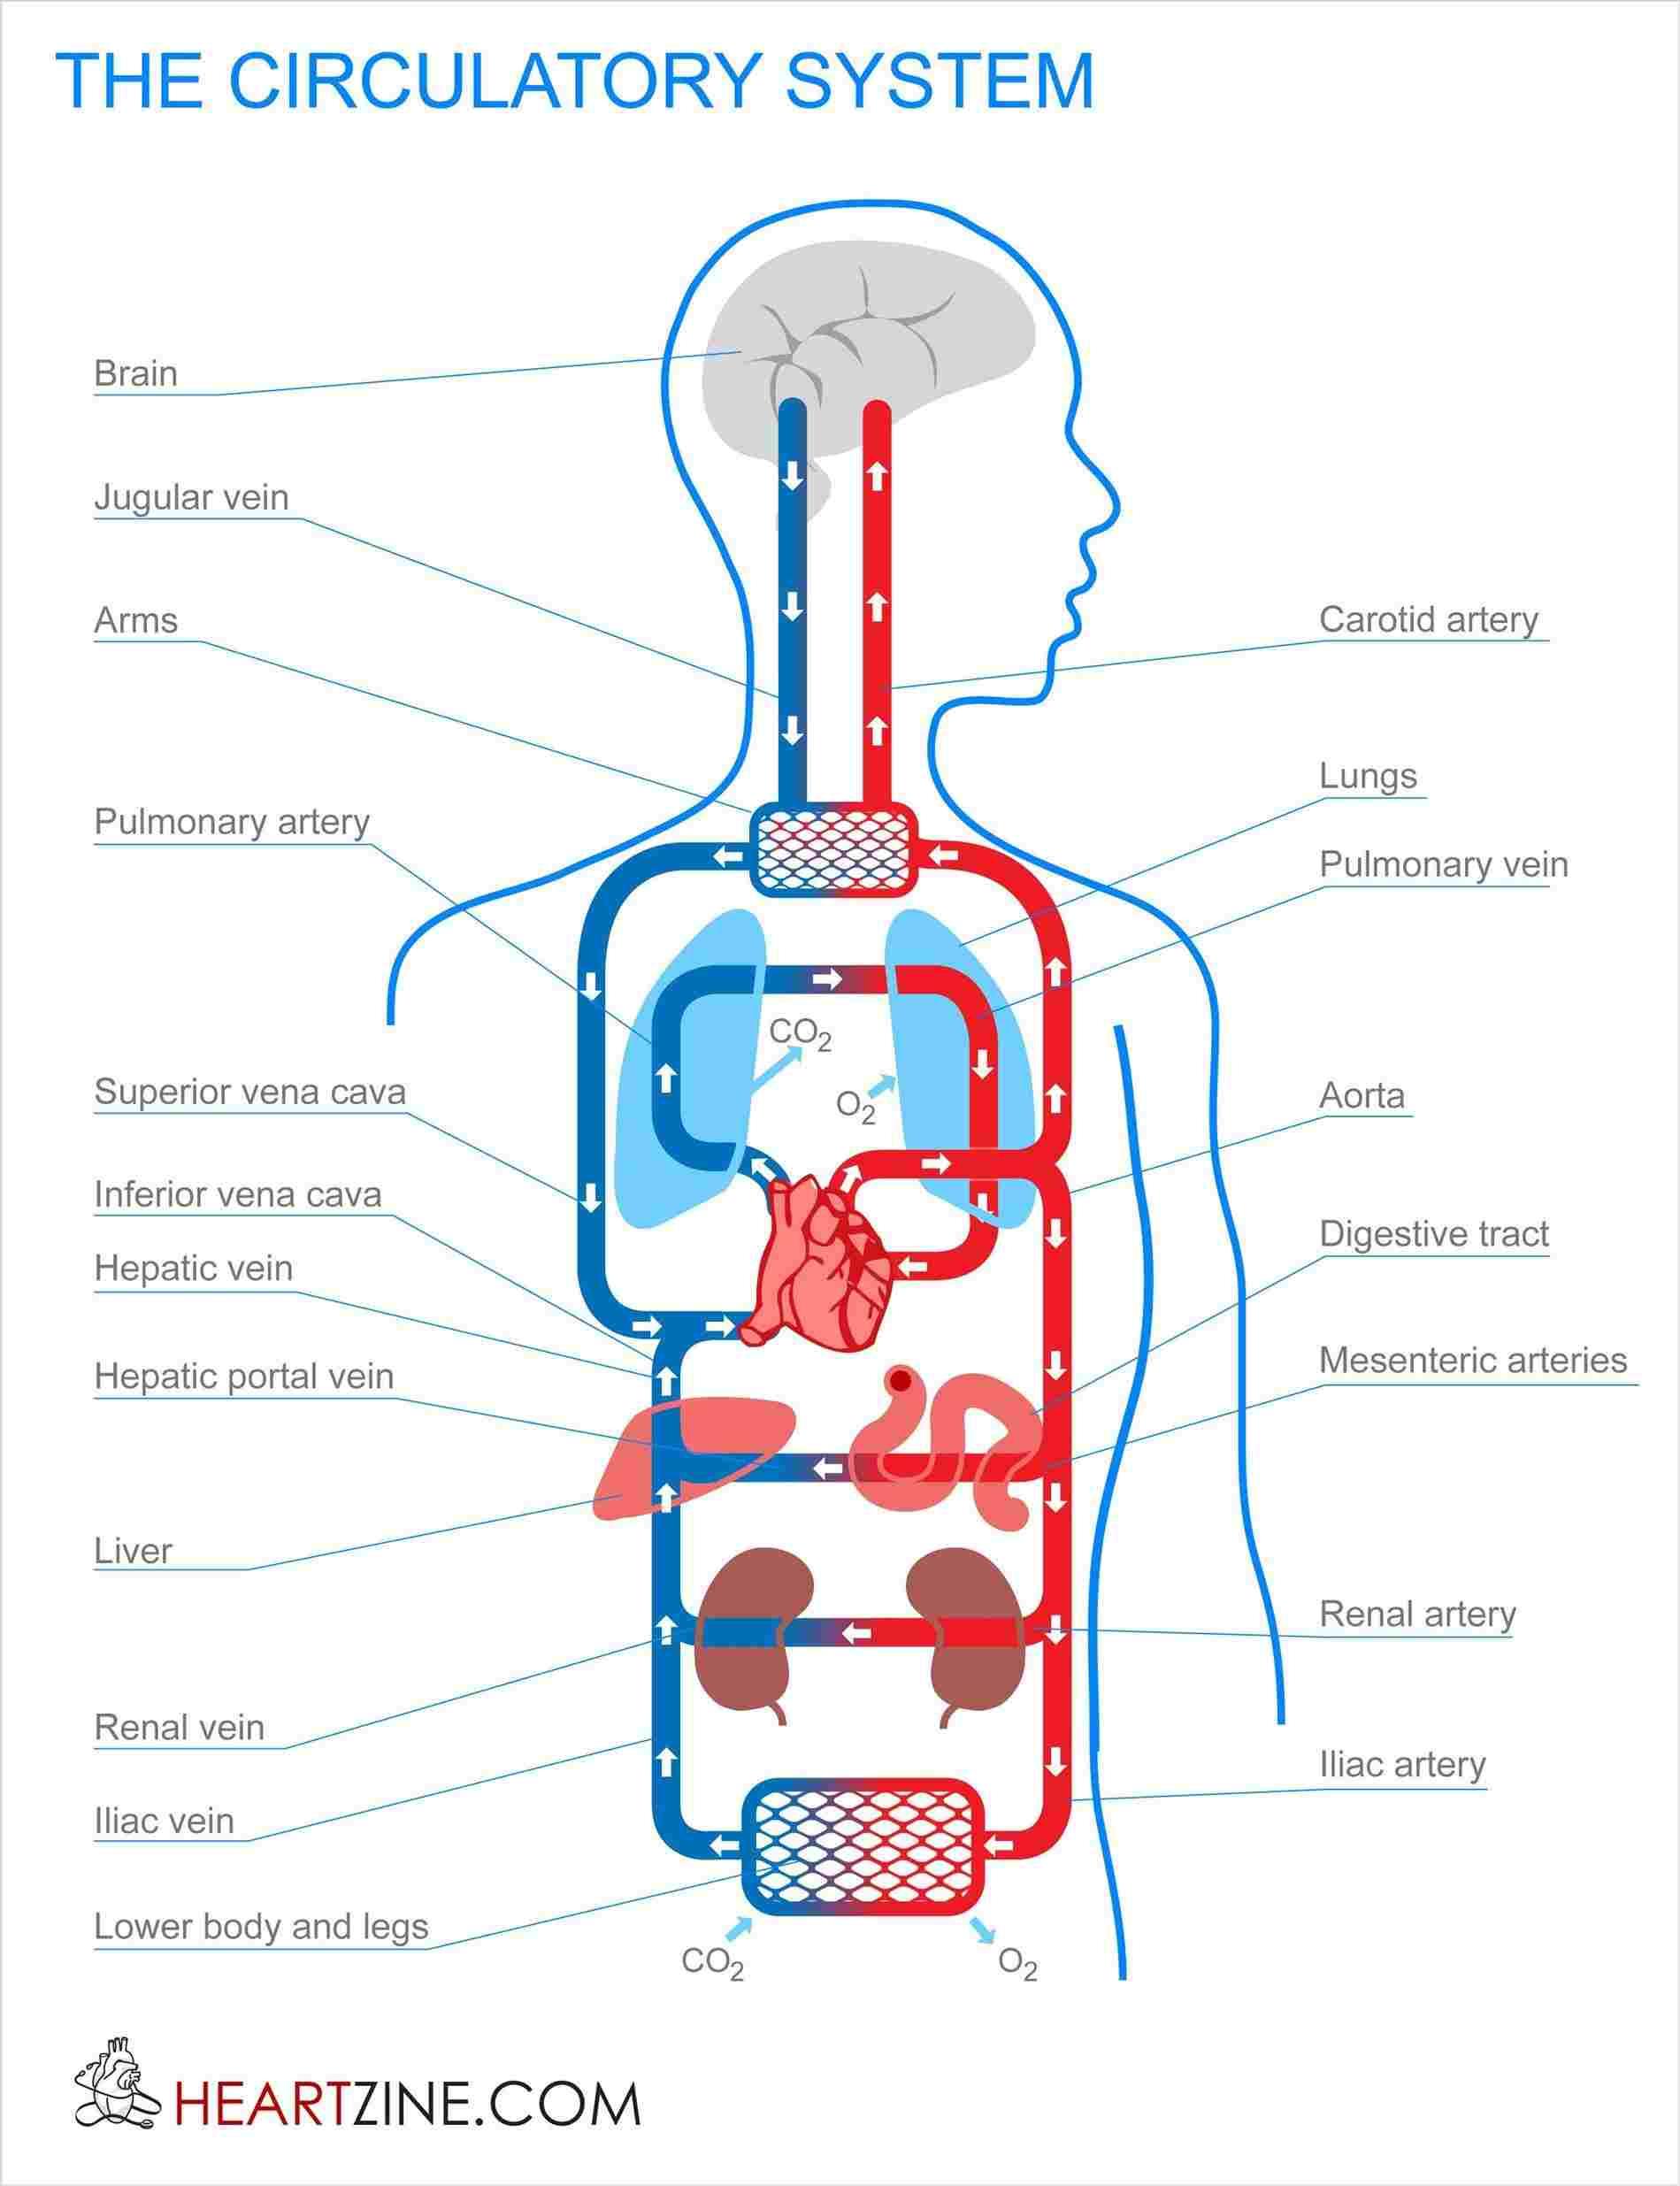 Veins And Arteries Diagram Human Veins And Arteries Diagram Diagram Of Anatomy